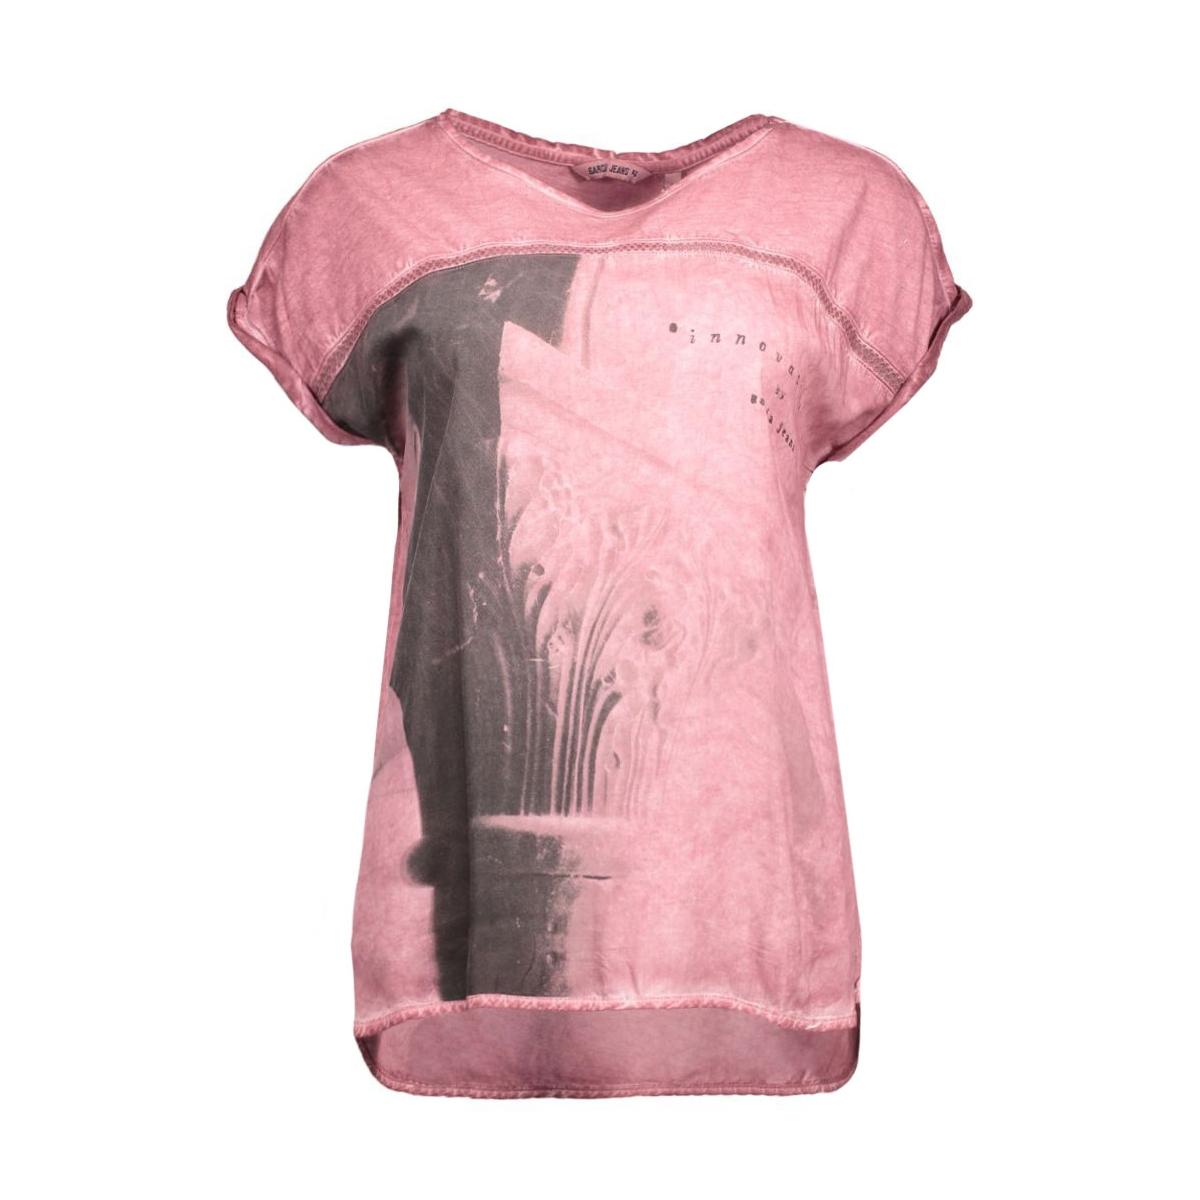 t60225 garcia t-shirt 1961 soft rose